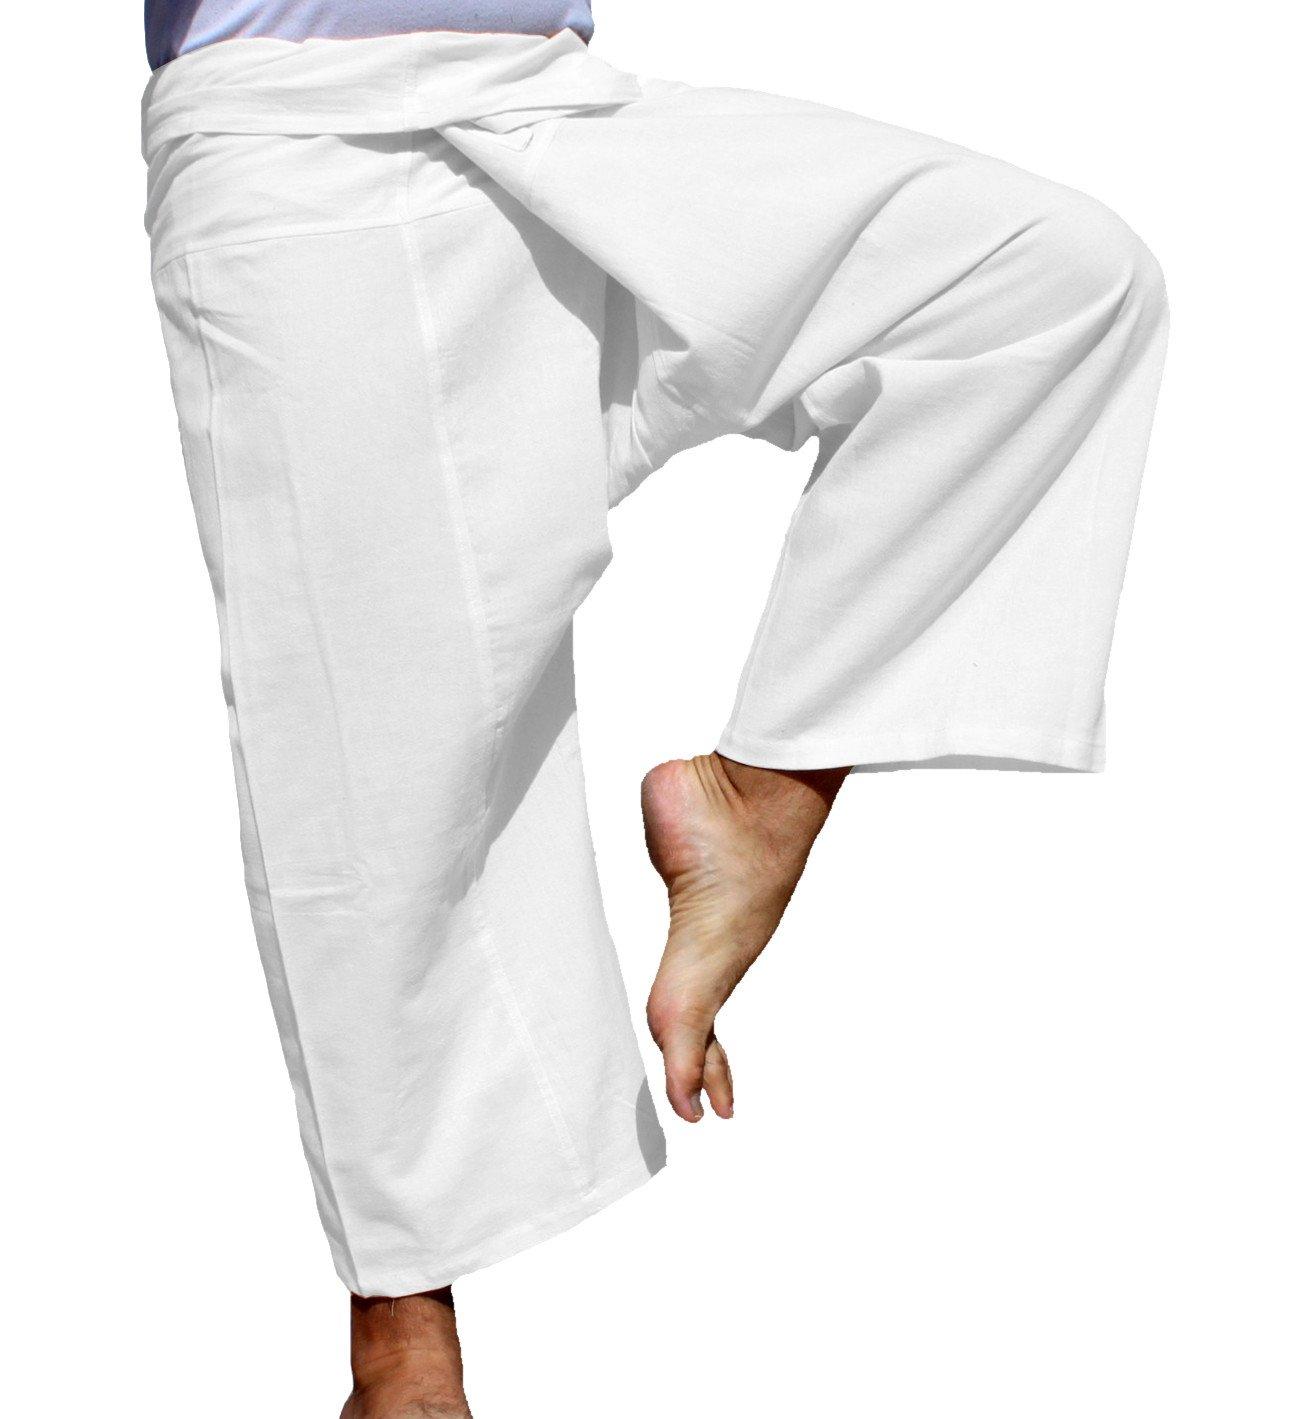 Raan Pah Muang PANTS メンズ B01DYYYOI2 S ホワイト ホワイト S